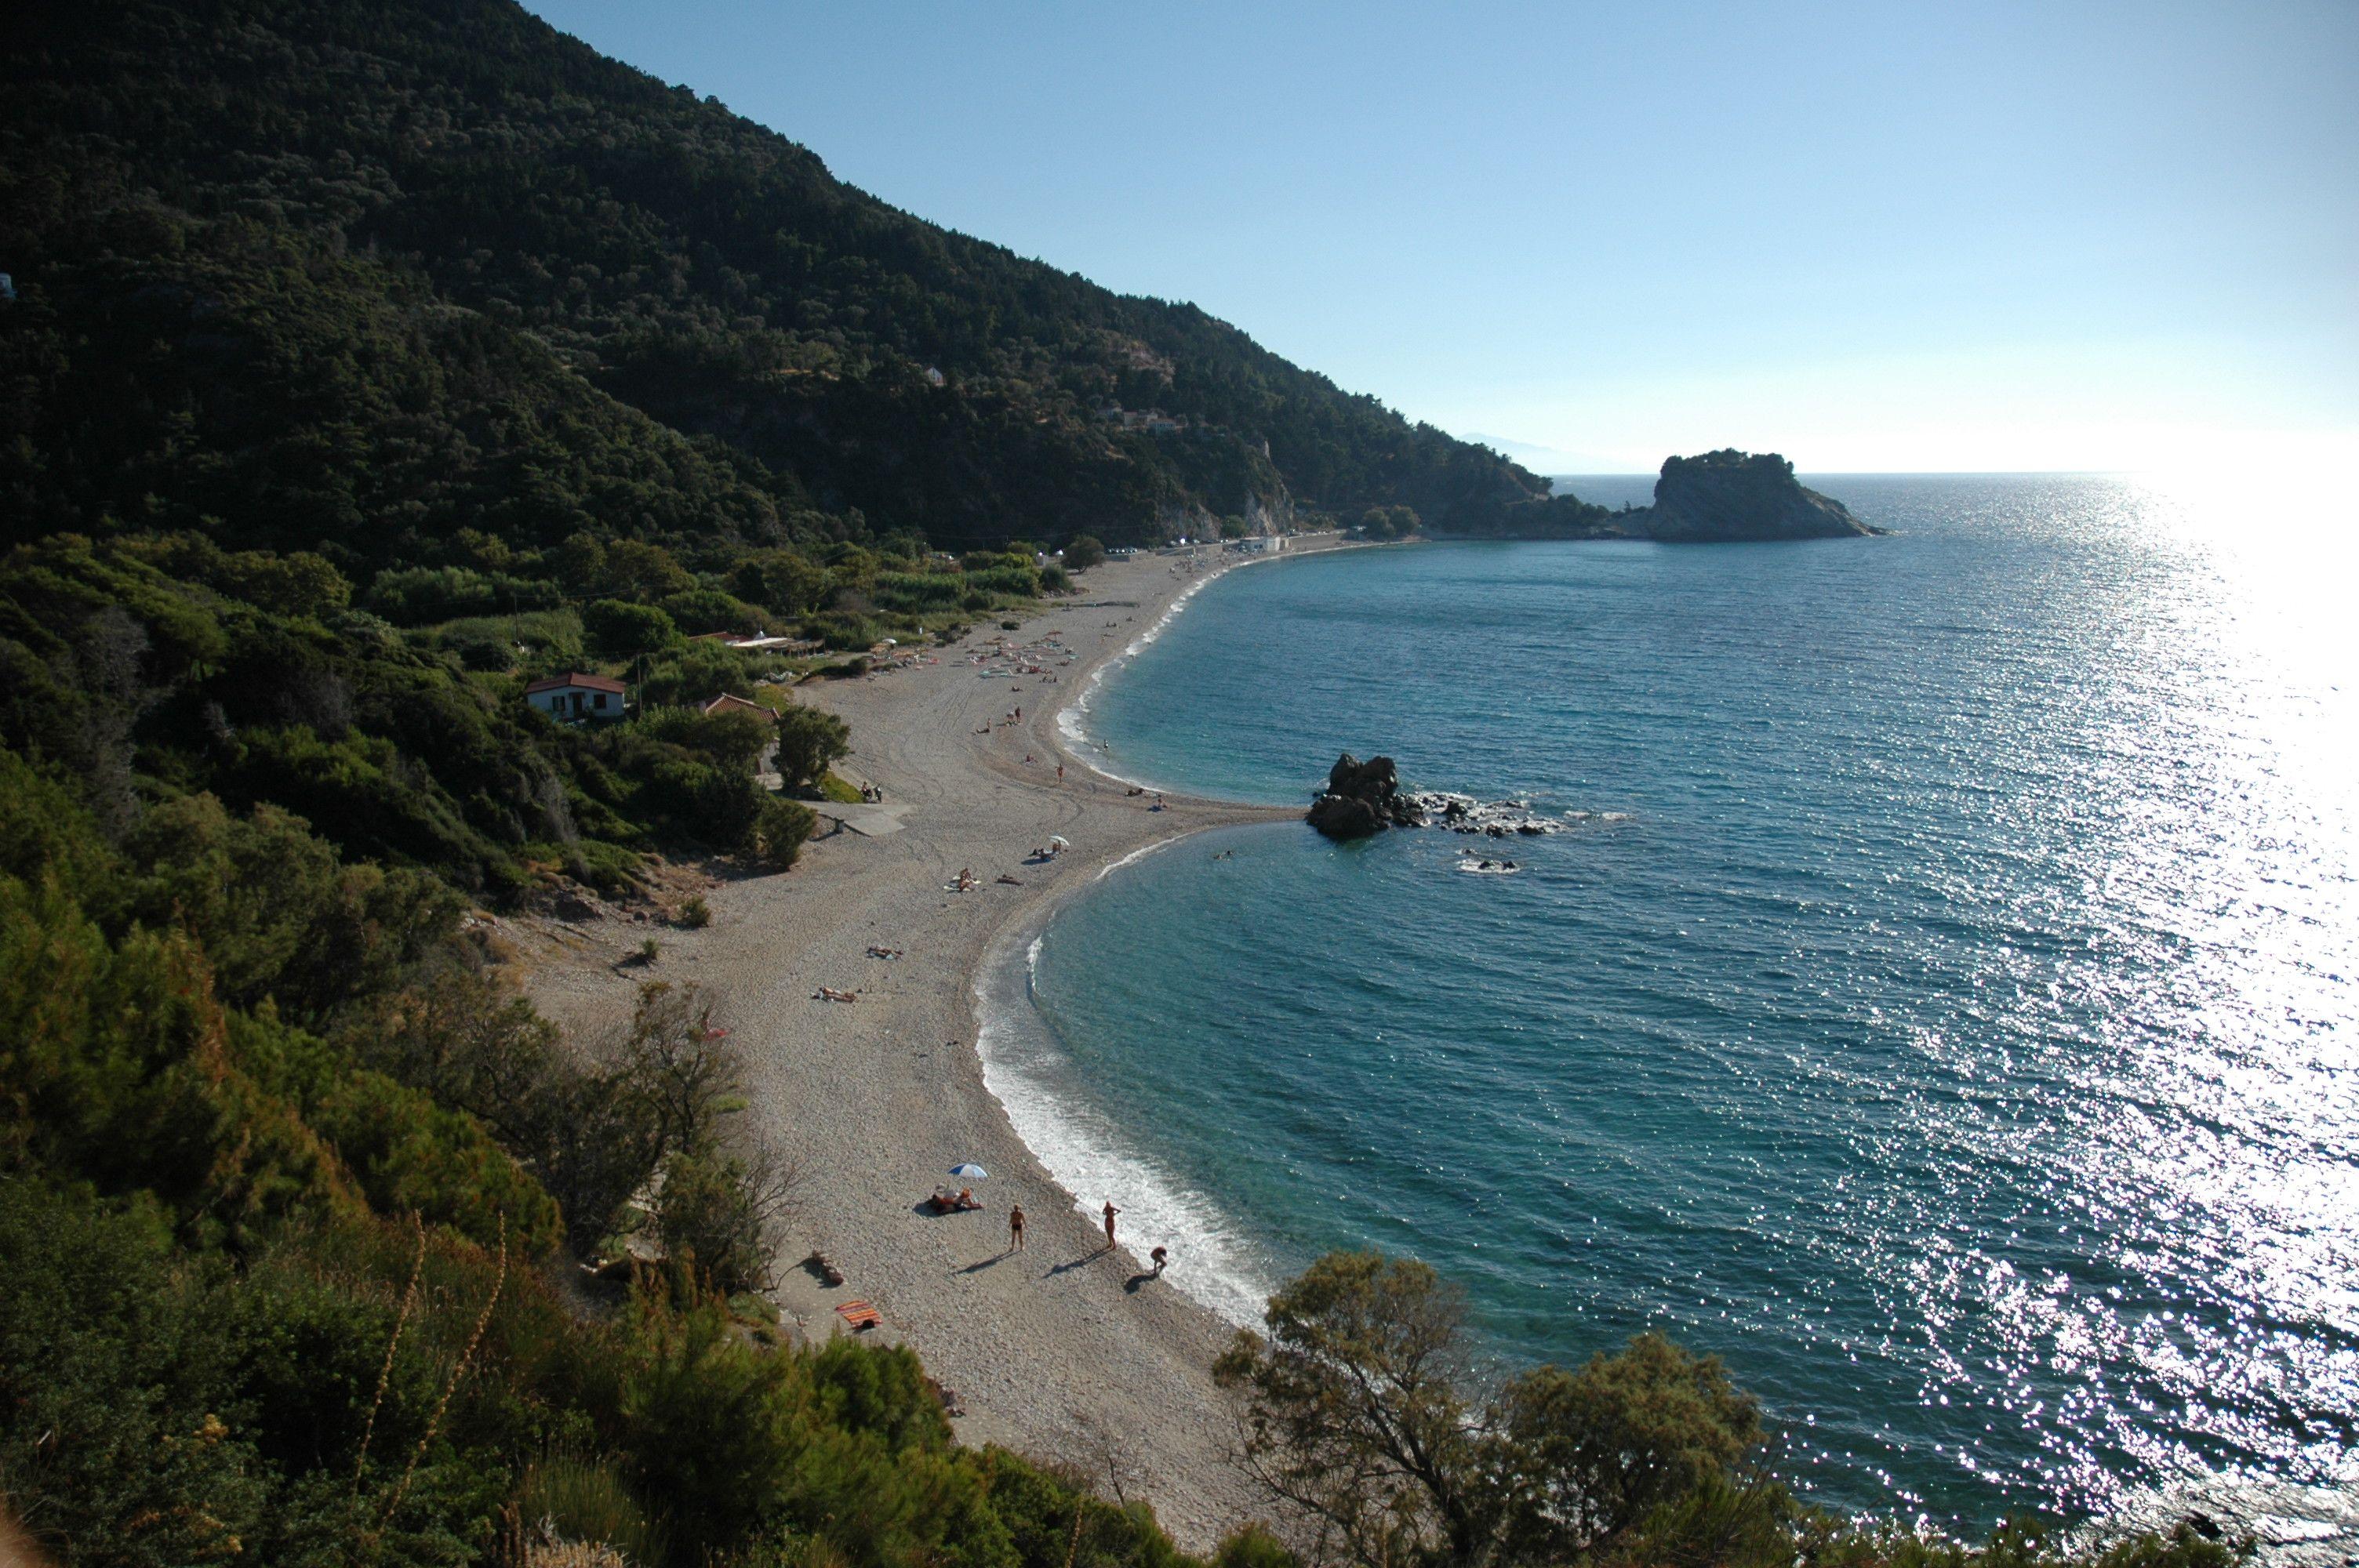 Samos, photo taken by Demetra Vartzikos